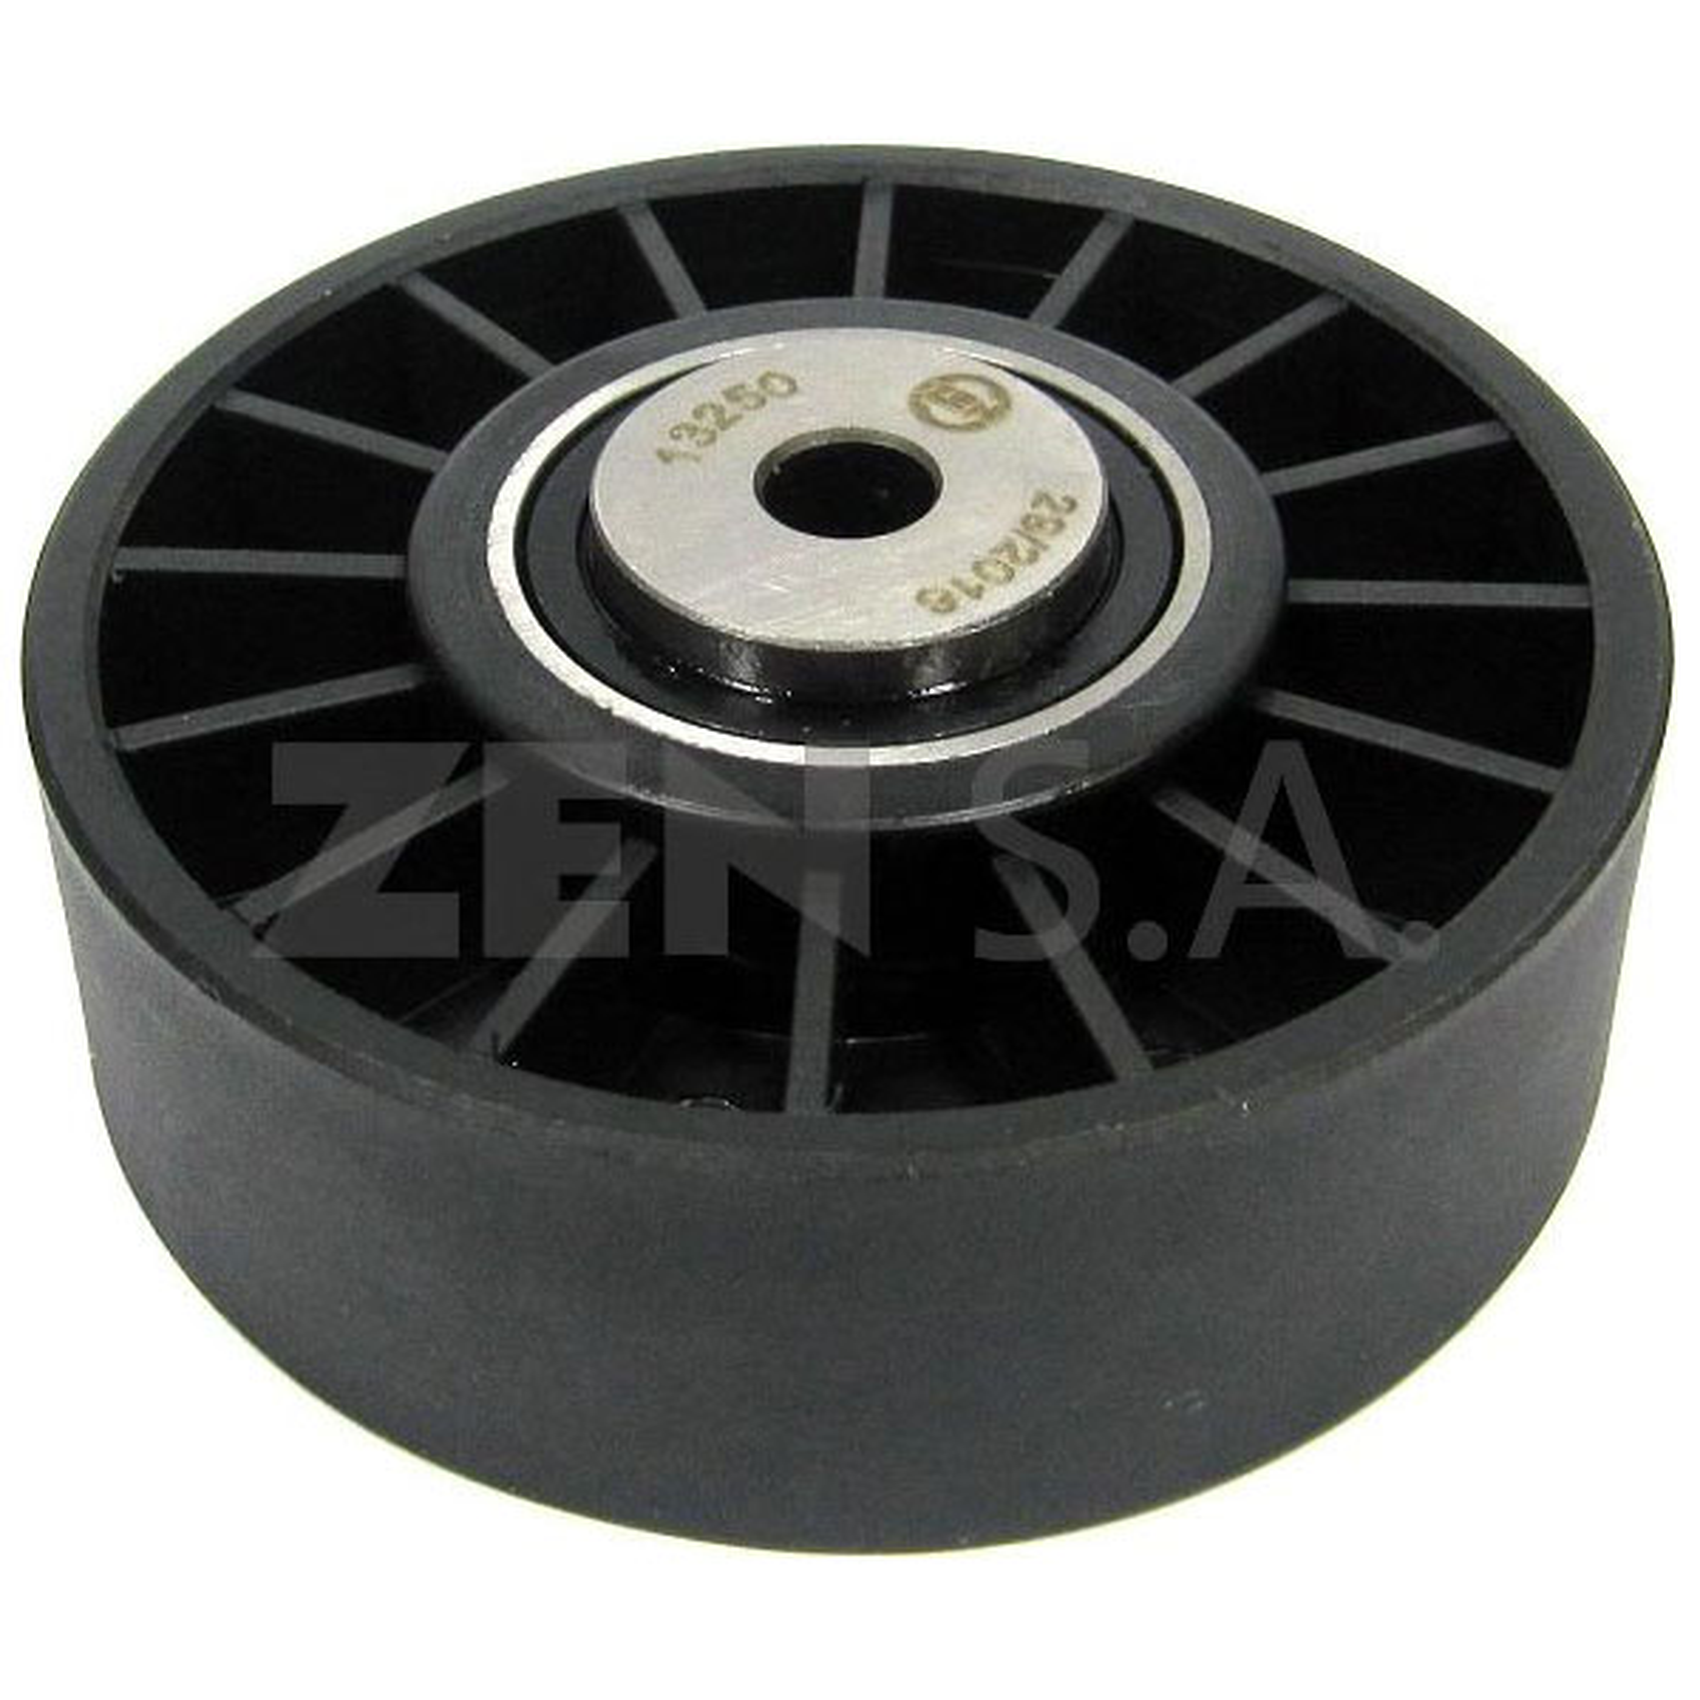 Polia Tensora Alternador BLAZER F250 S10 VOLARE - Motor 2.8